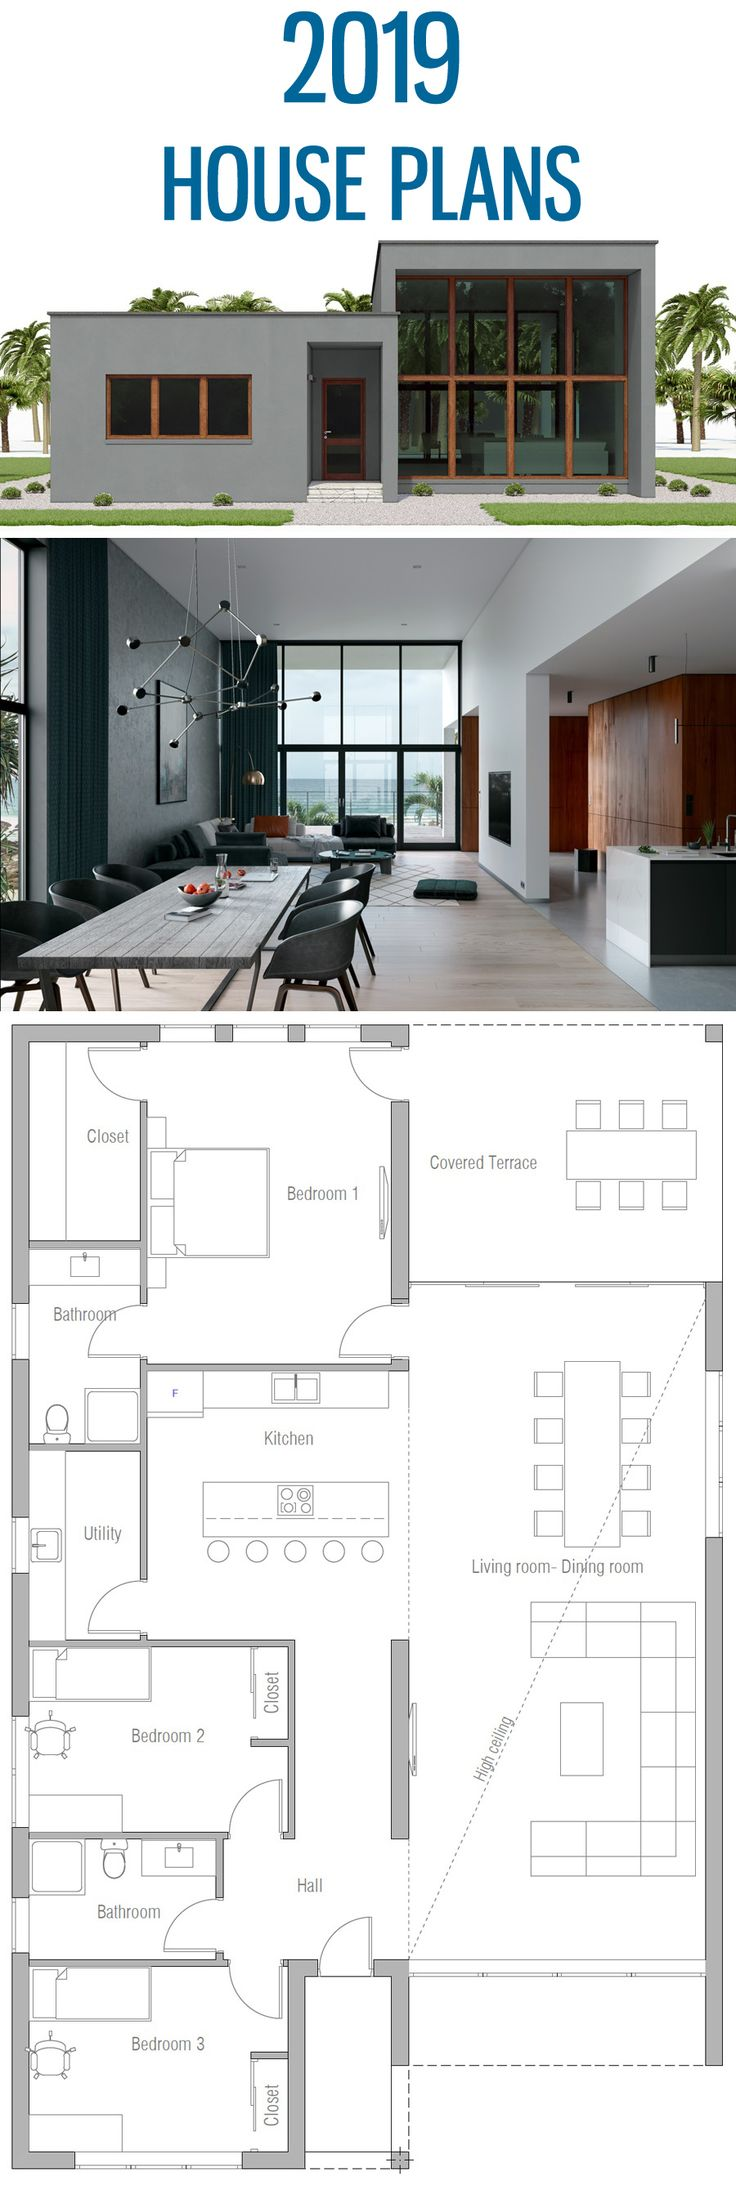 Modern House Plan, Minimalist House Designs #homeplans #houseplans #newhomes – Tibor Reisz